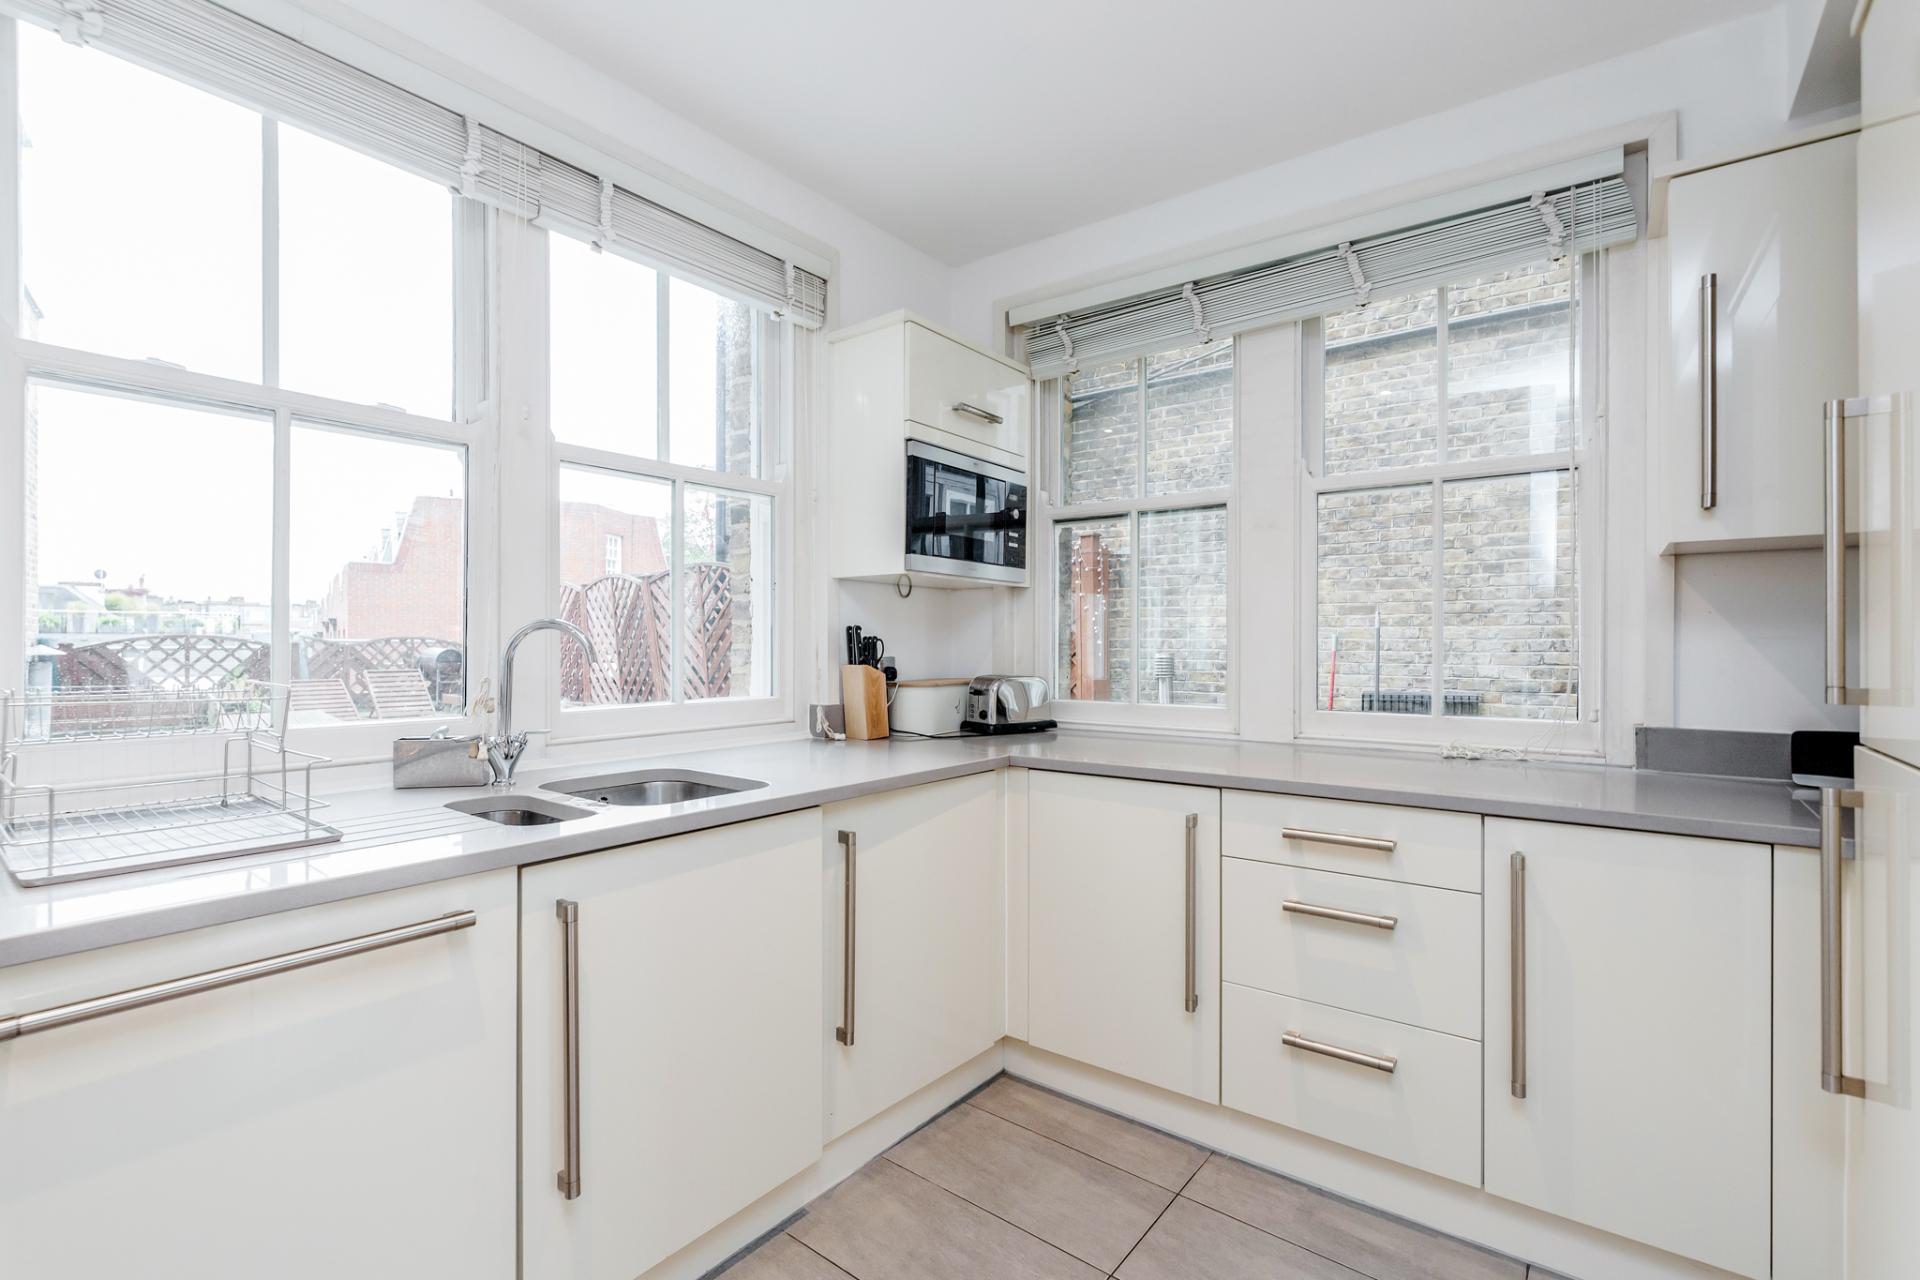 Kitchen at Eden Close Apartment, Kensington, London - Citybase Apartments